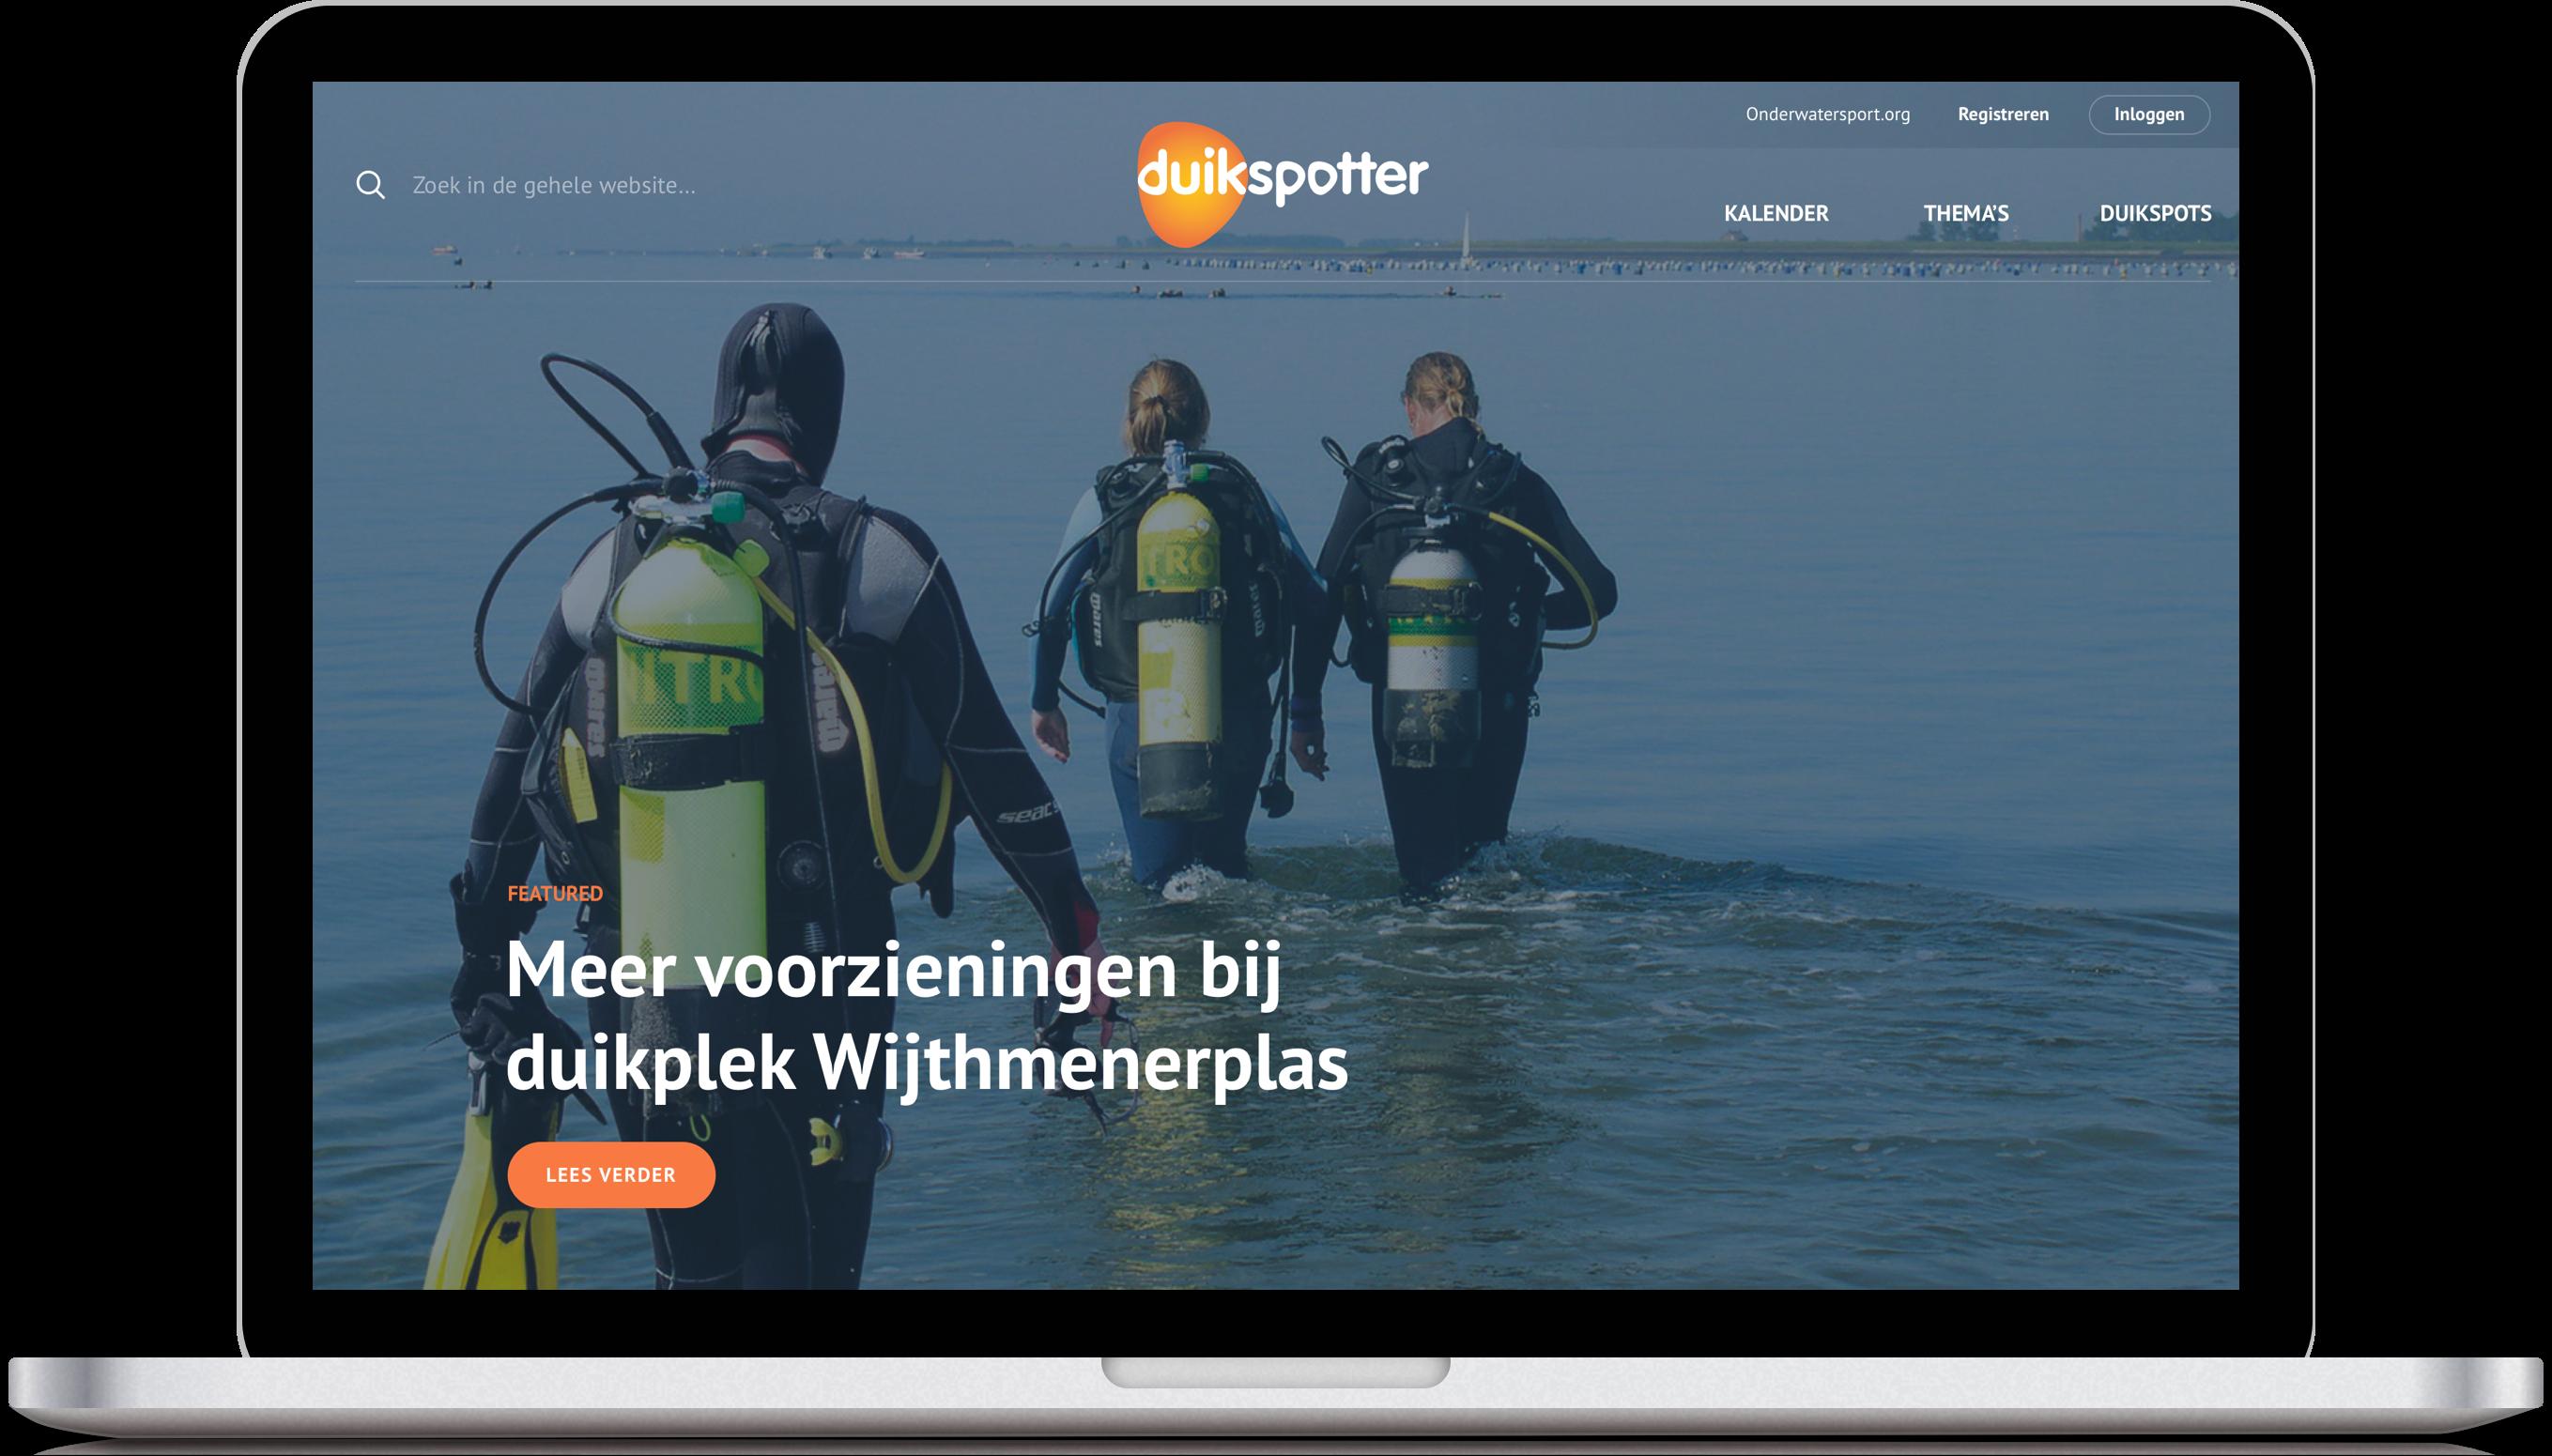 Homepage duikspotter